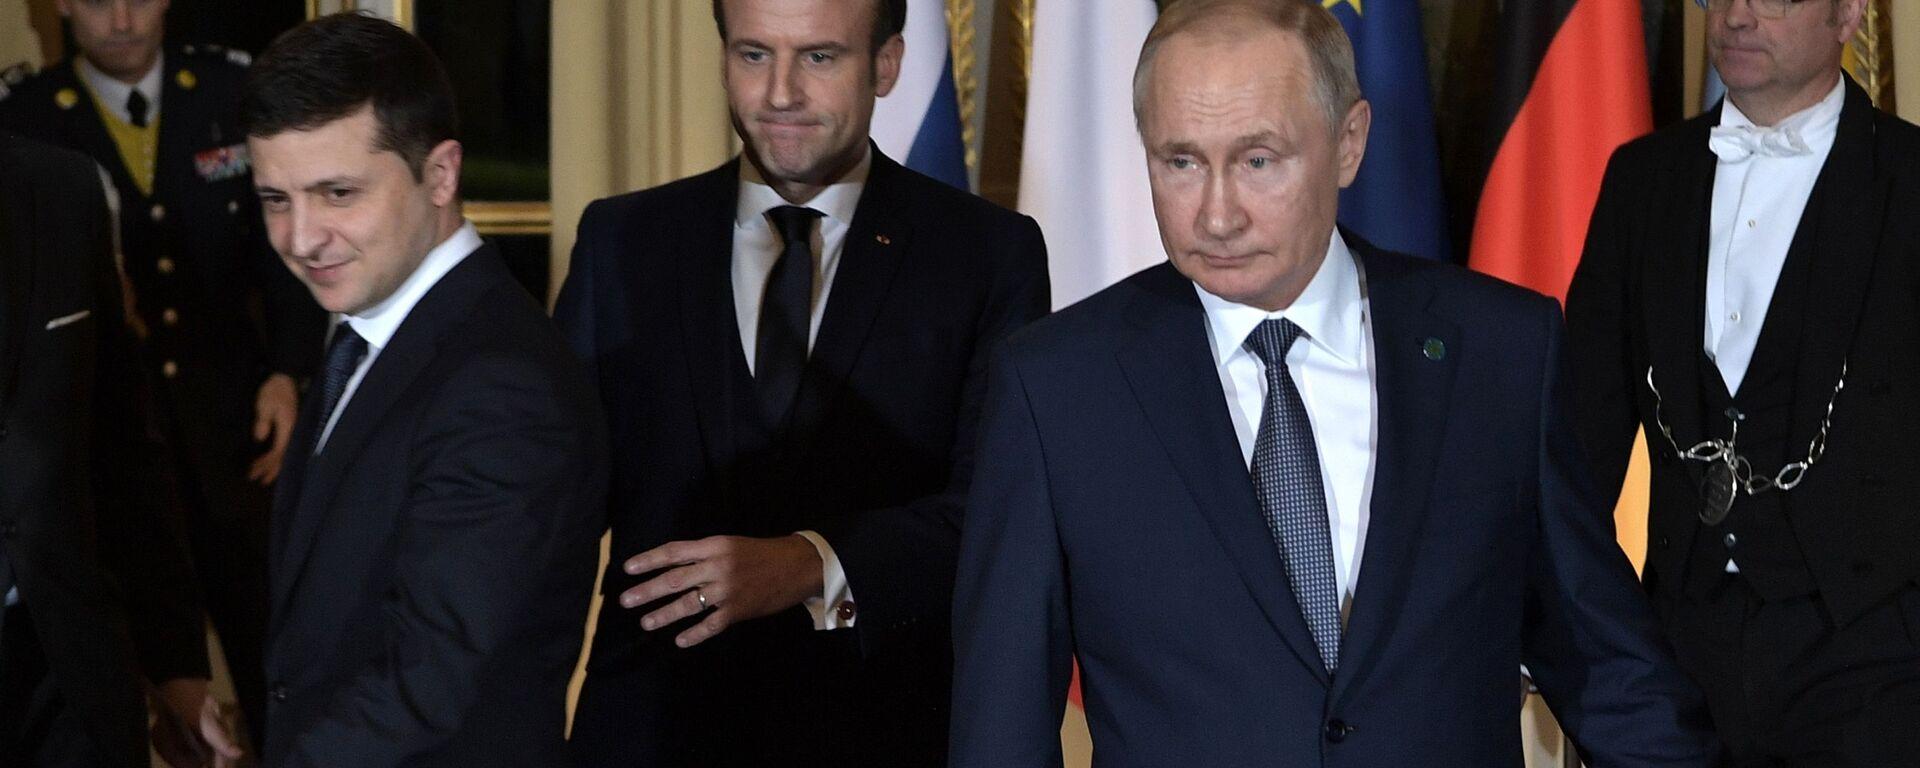 Рабочий визит президента РФ В. Путина во Францию  - Sputnik Узбекистан, 1920, 10.06.2021